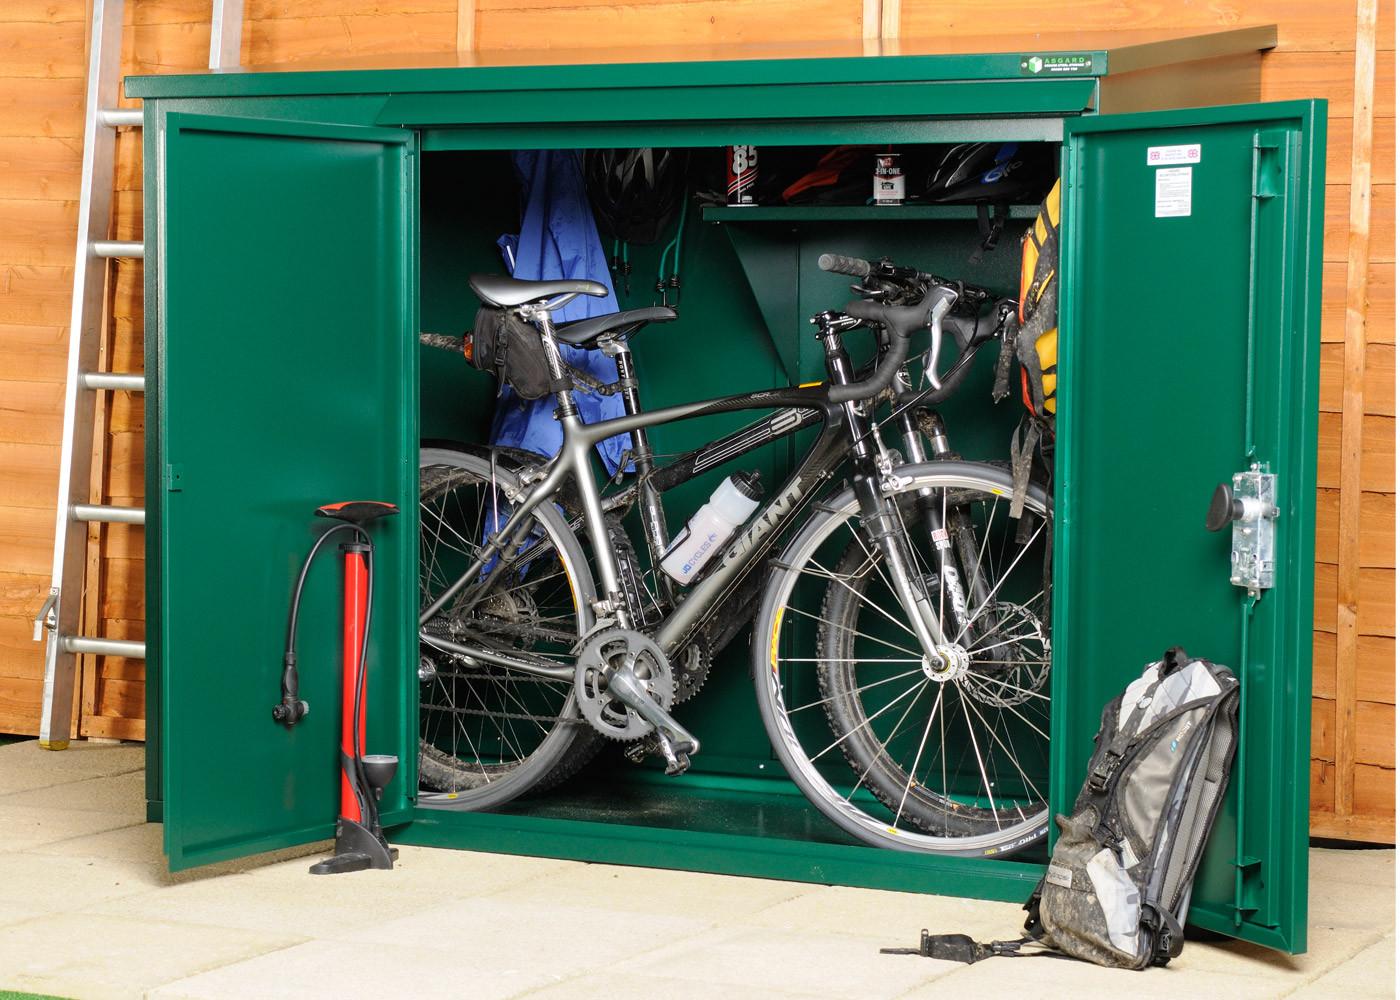 metal bike shed, storage for storing 3 bikes ... ZNQTXLF